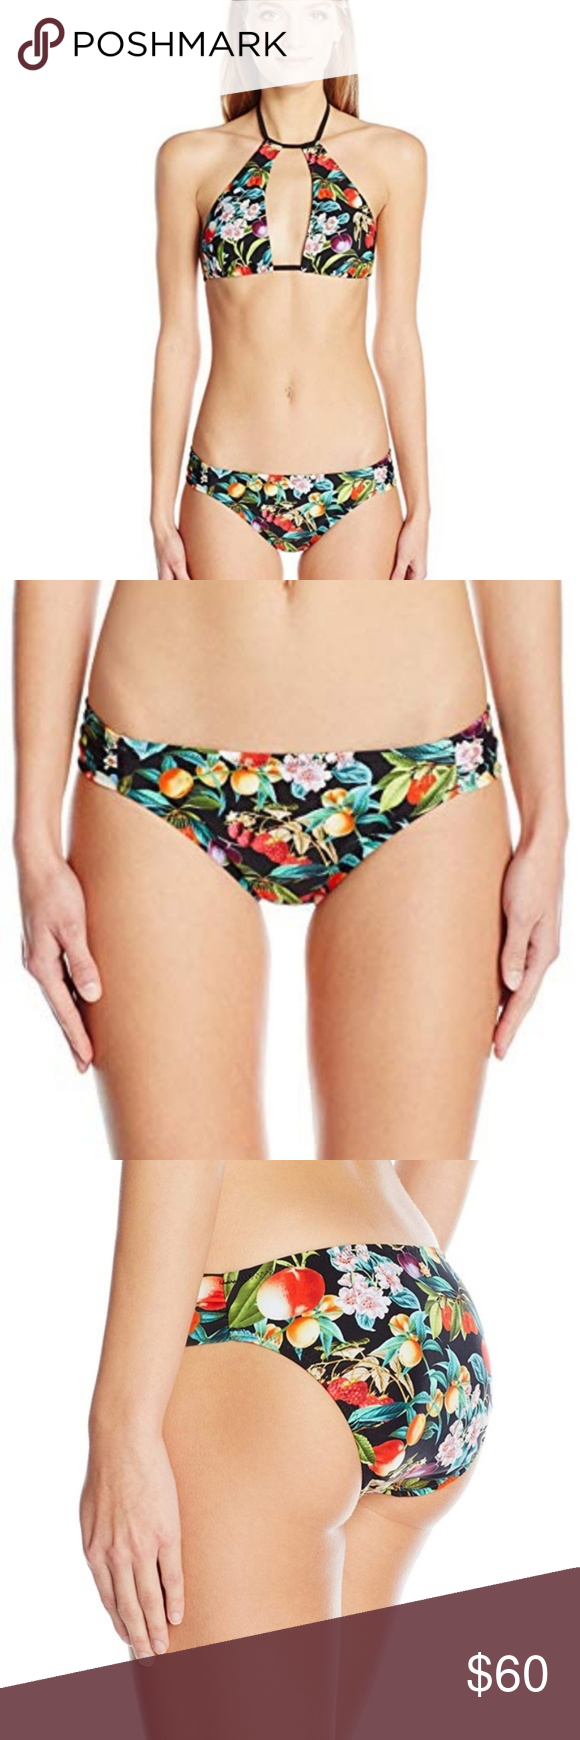 Nanette Lepore Amor Atitlan Siren Bikini Bottom Nanette lepore. Color/pattern: black knit bikini bottom. Graphic print waistband and cuffs. Tonal top stitching and panel seaming. Nanette Lepore Swim Bikinis